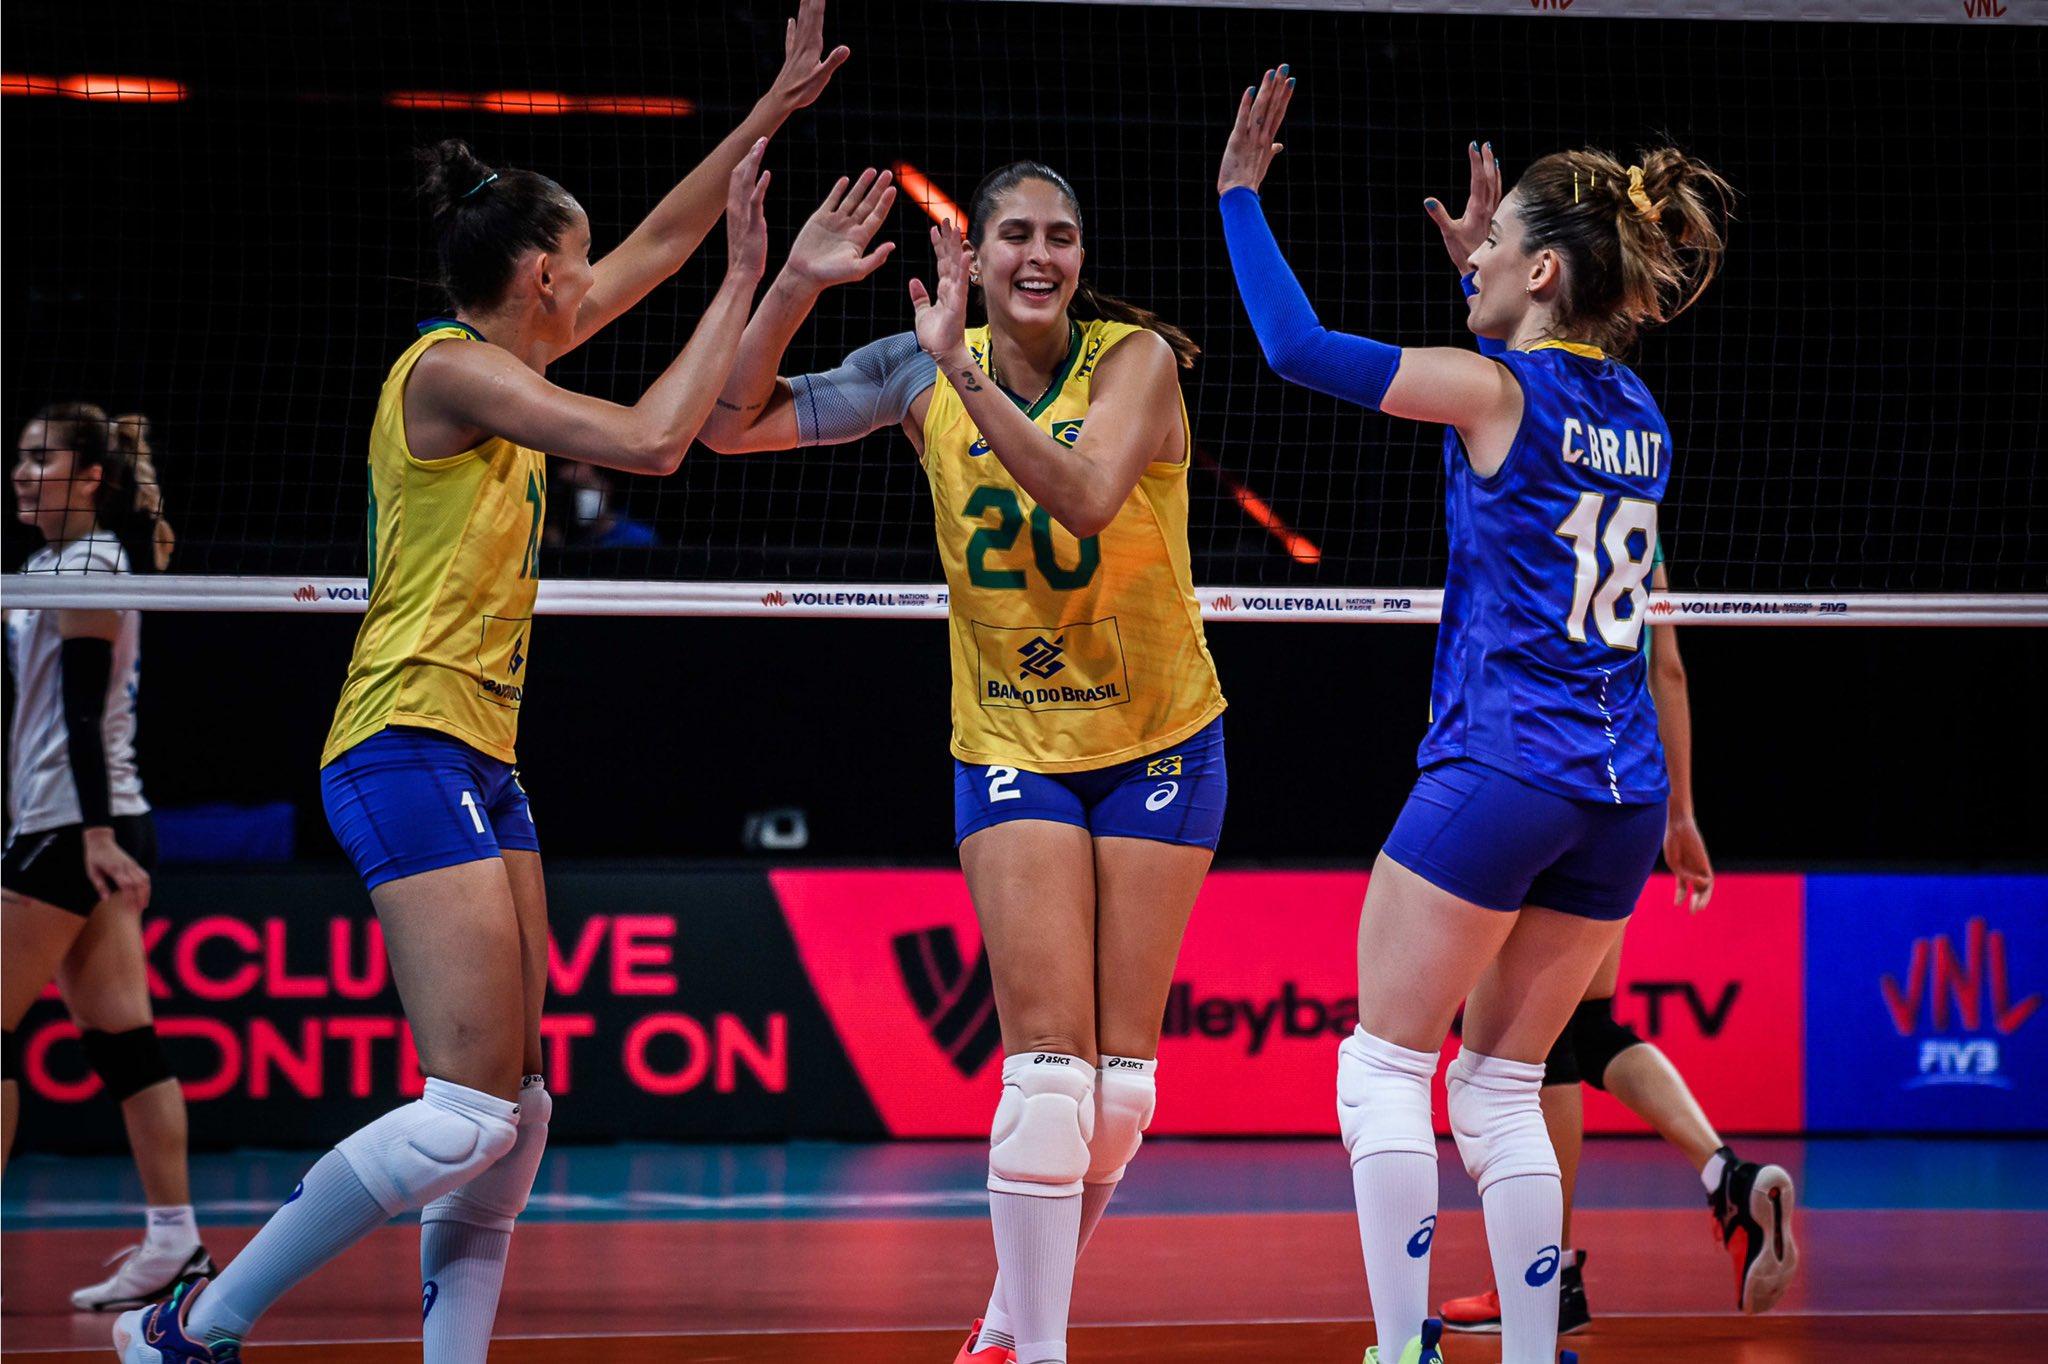 Brasil x Tailandia vôlei @volleyballworld